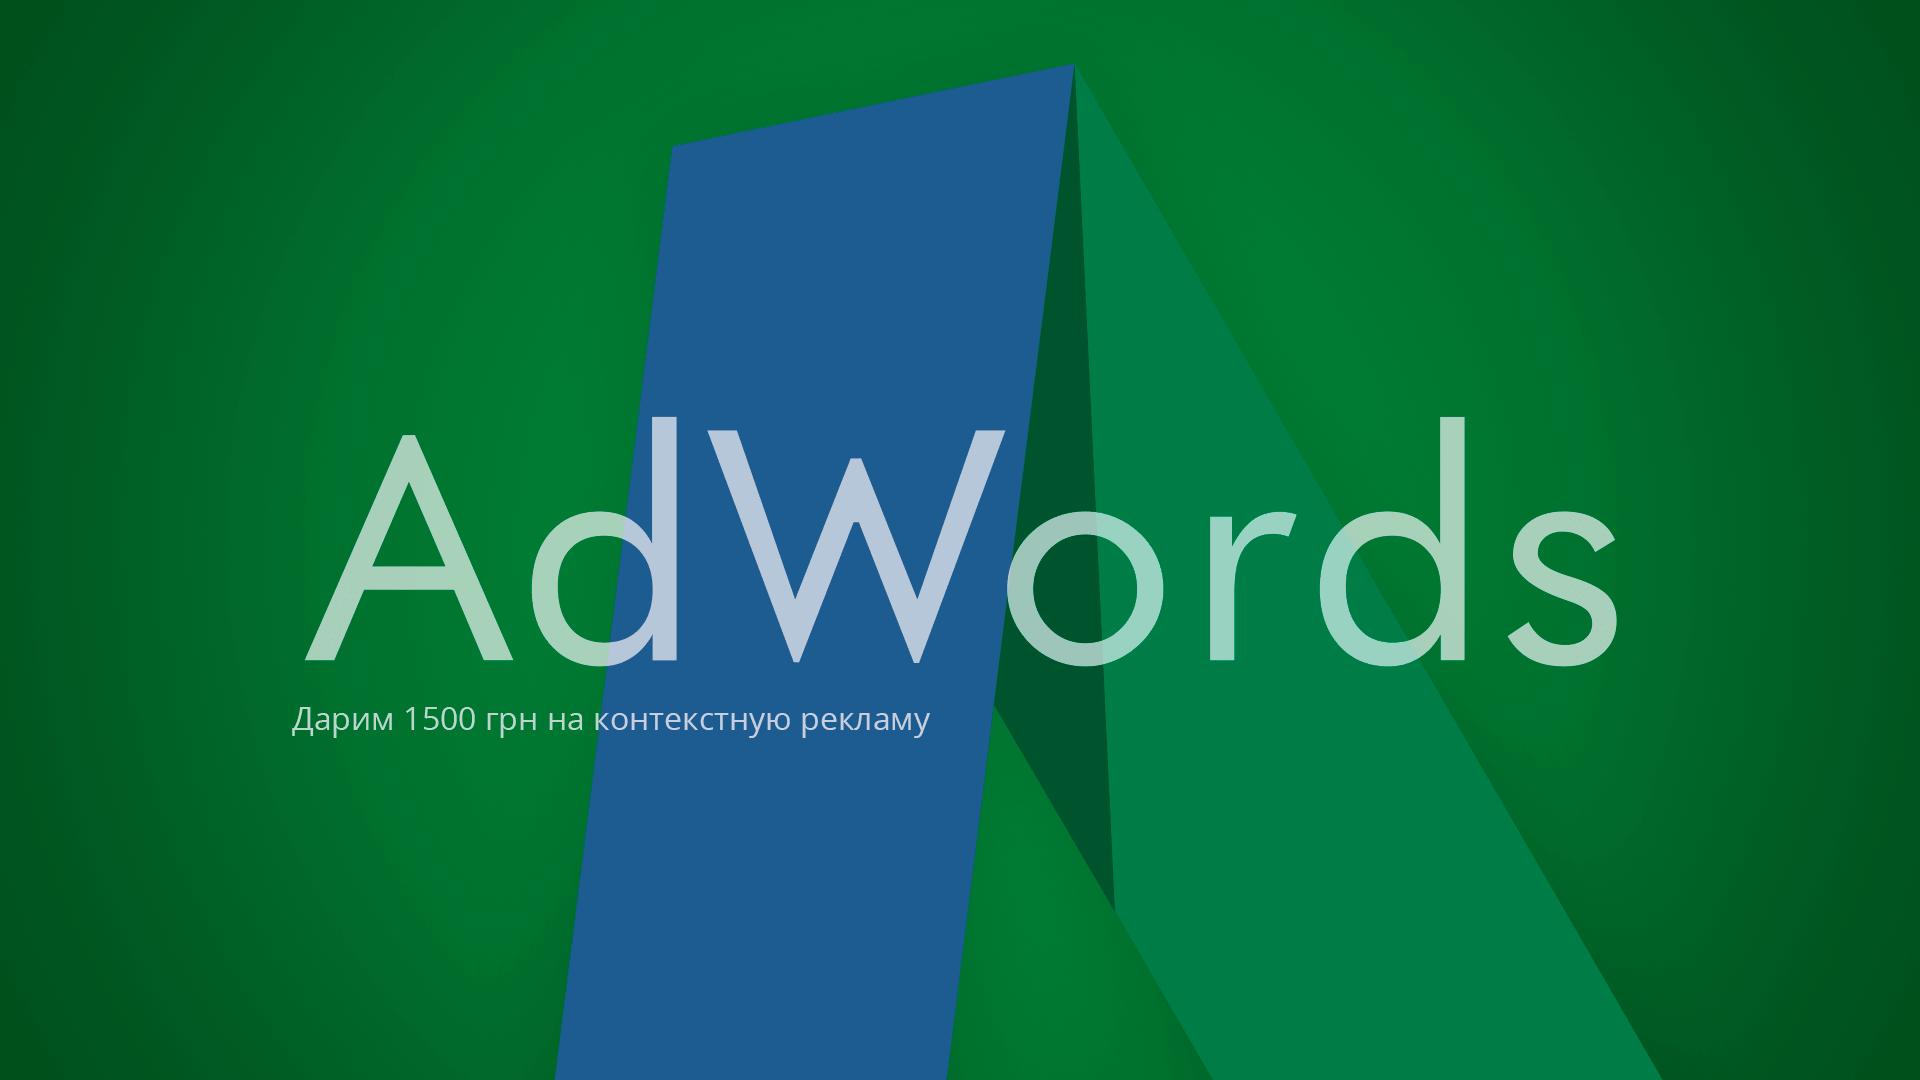 Дарим 1500 грн. на контекстную рекламу Google AdWords